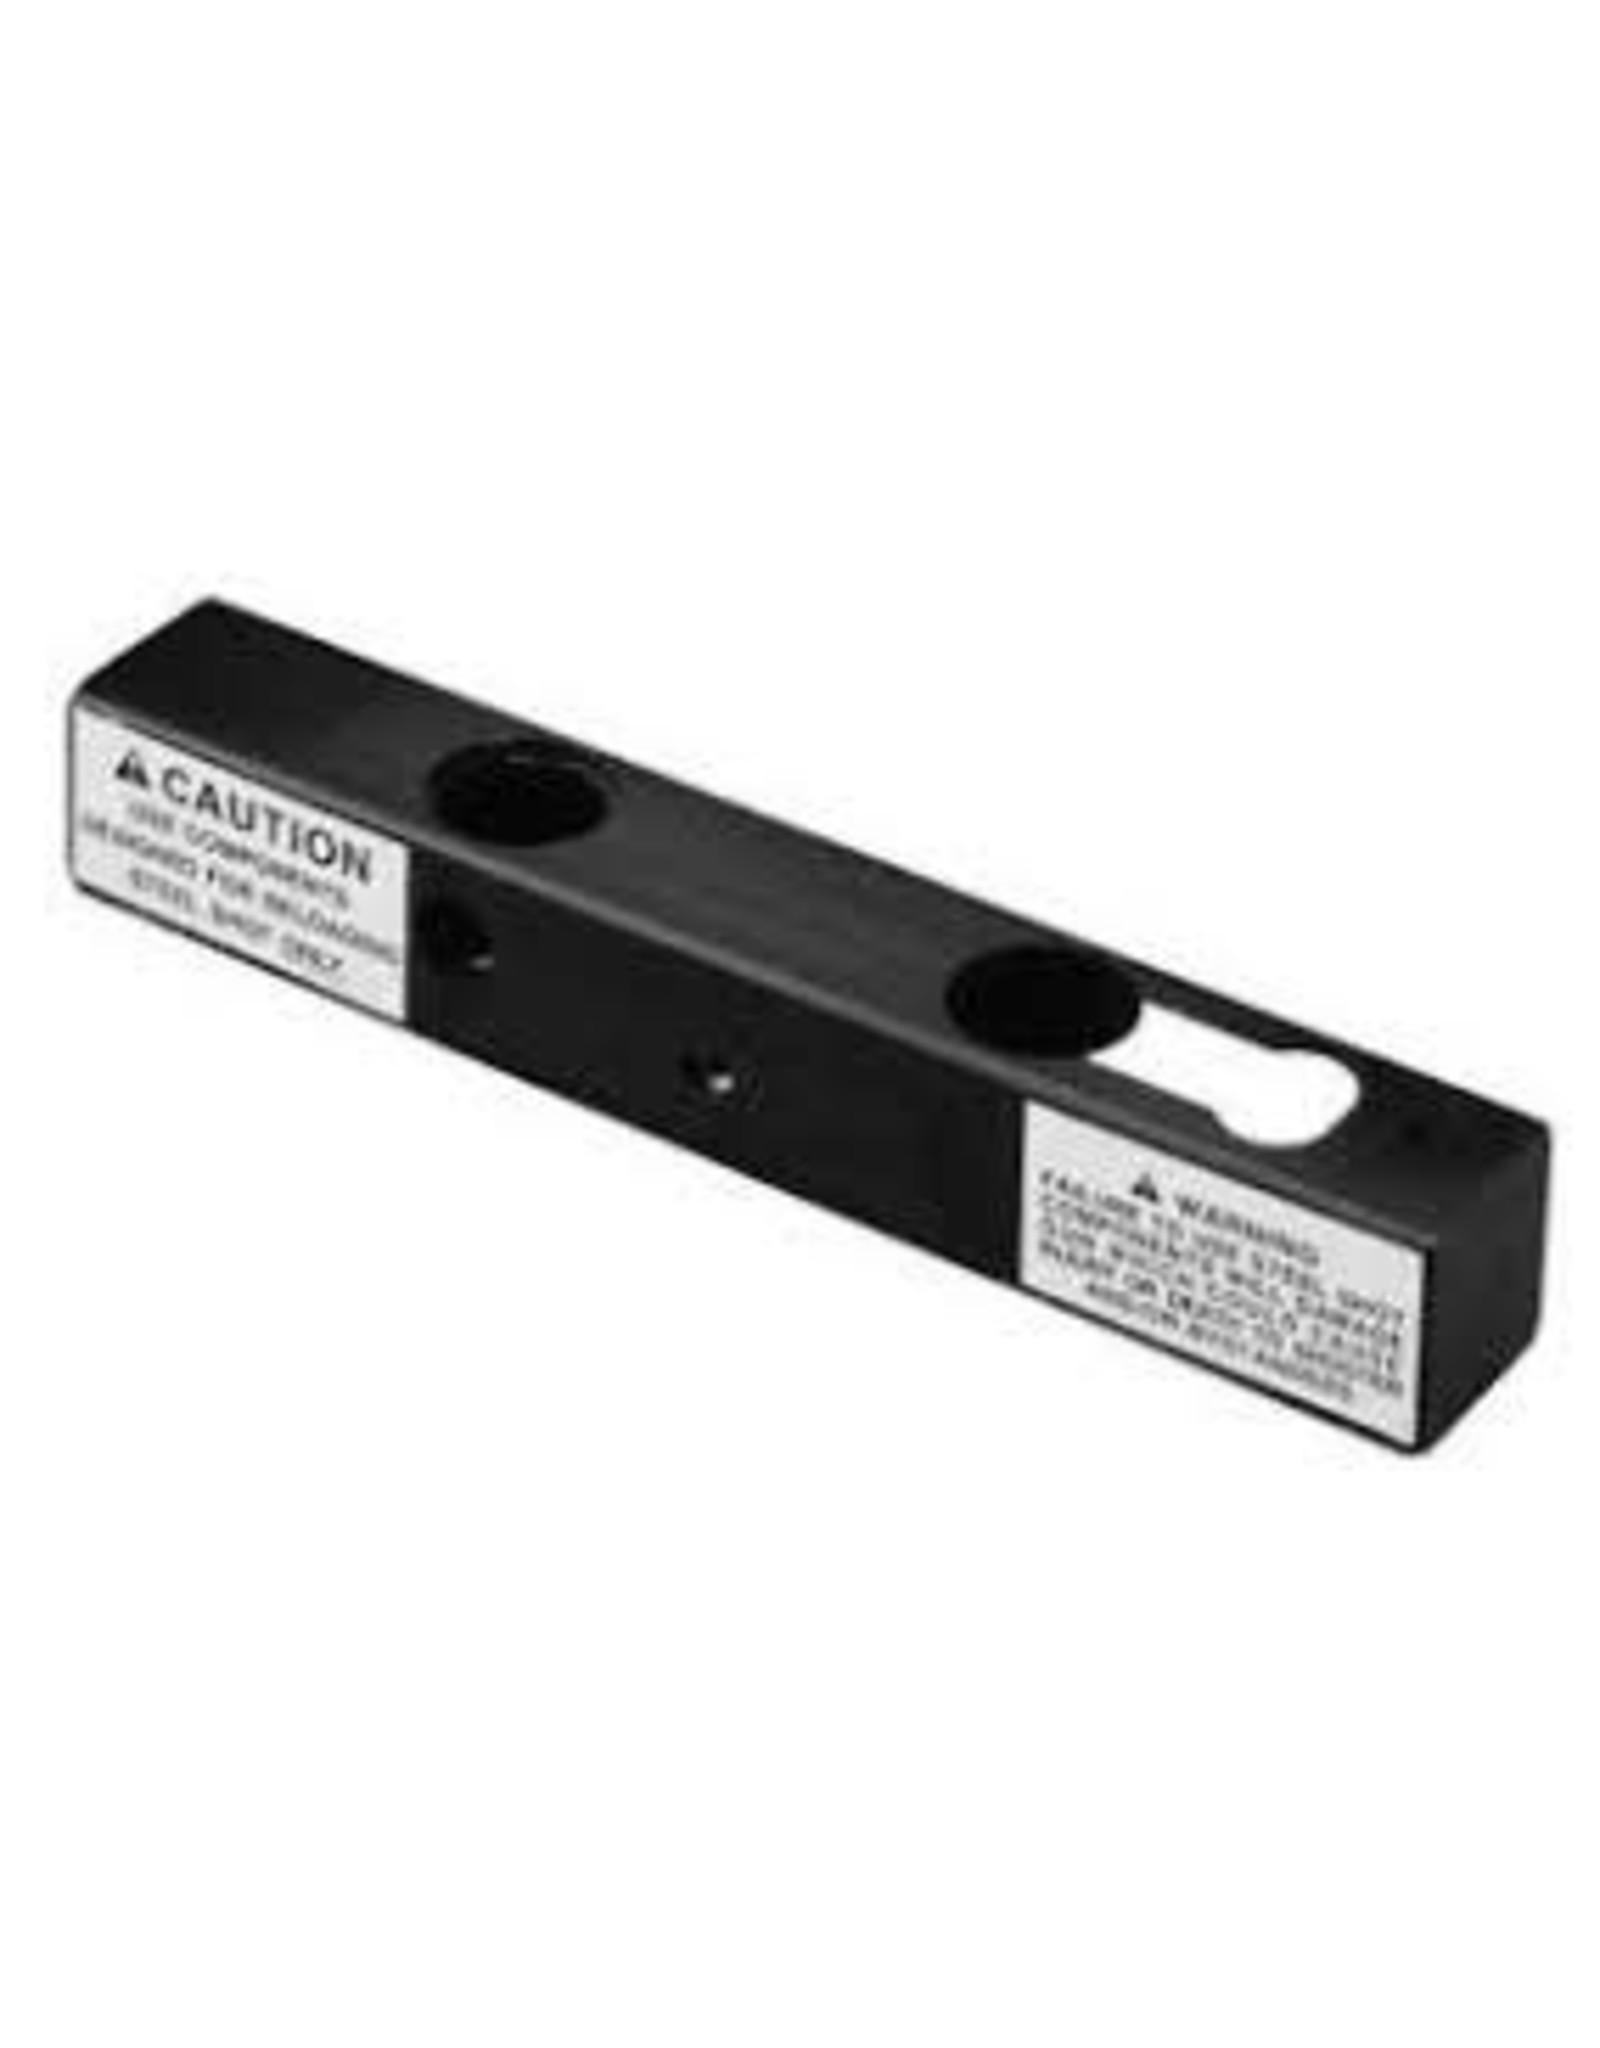 MEC MEC Steel Shot Charge Bar 1OZ #3 - #6